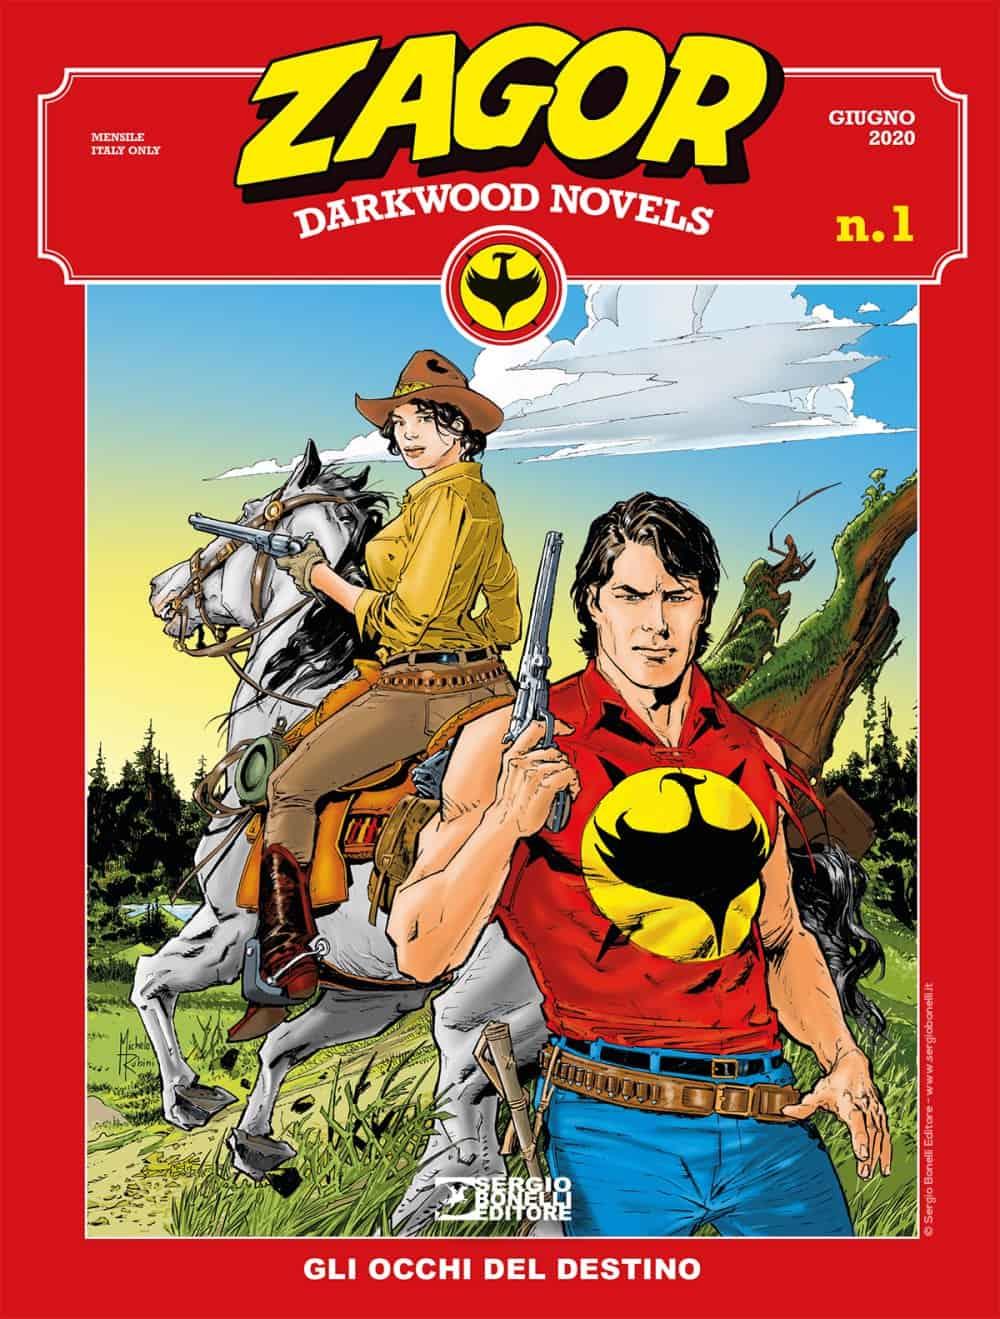 zagor darkwood novels bonelli